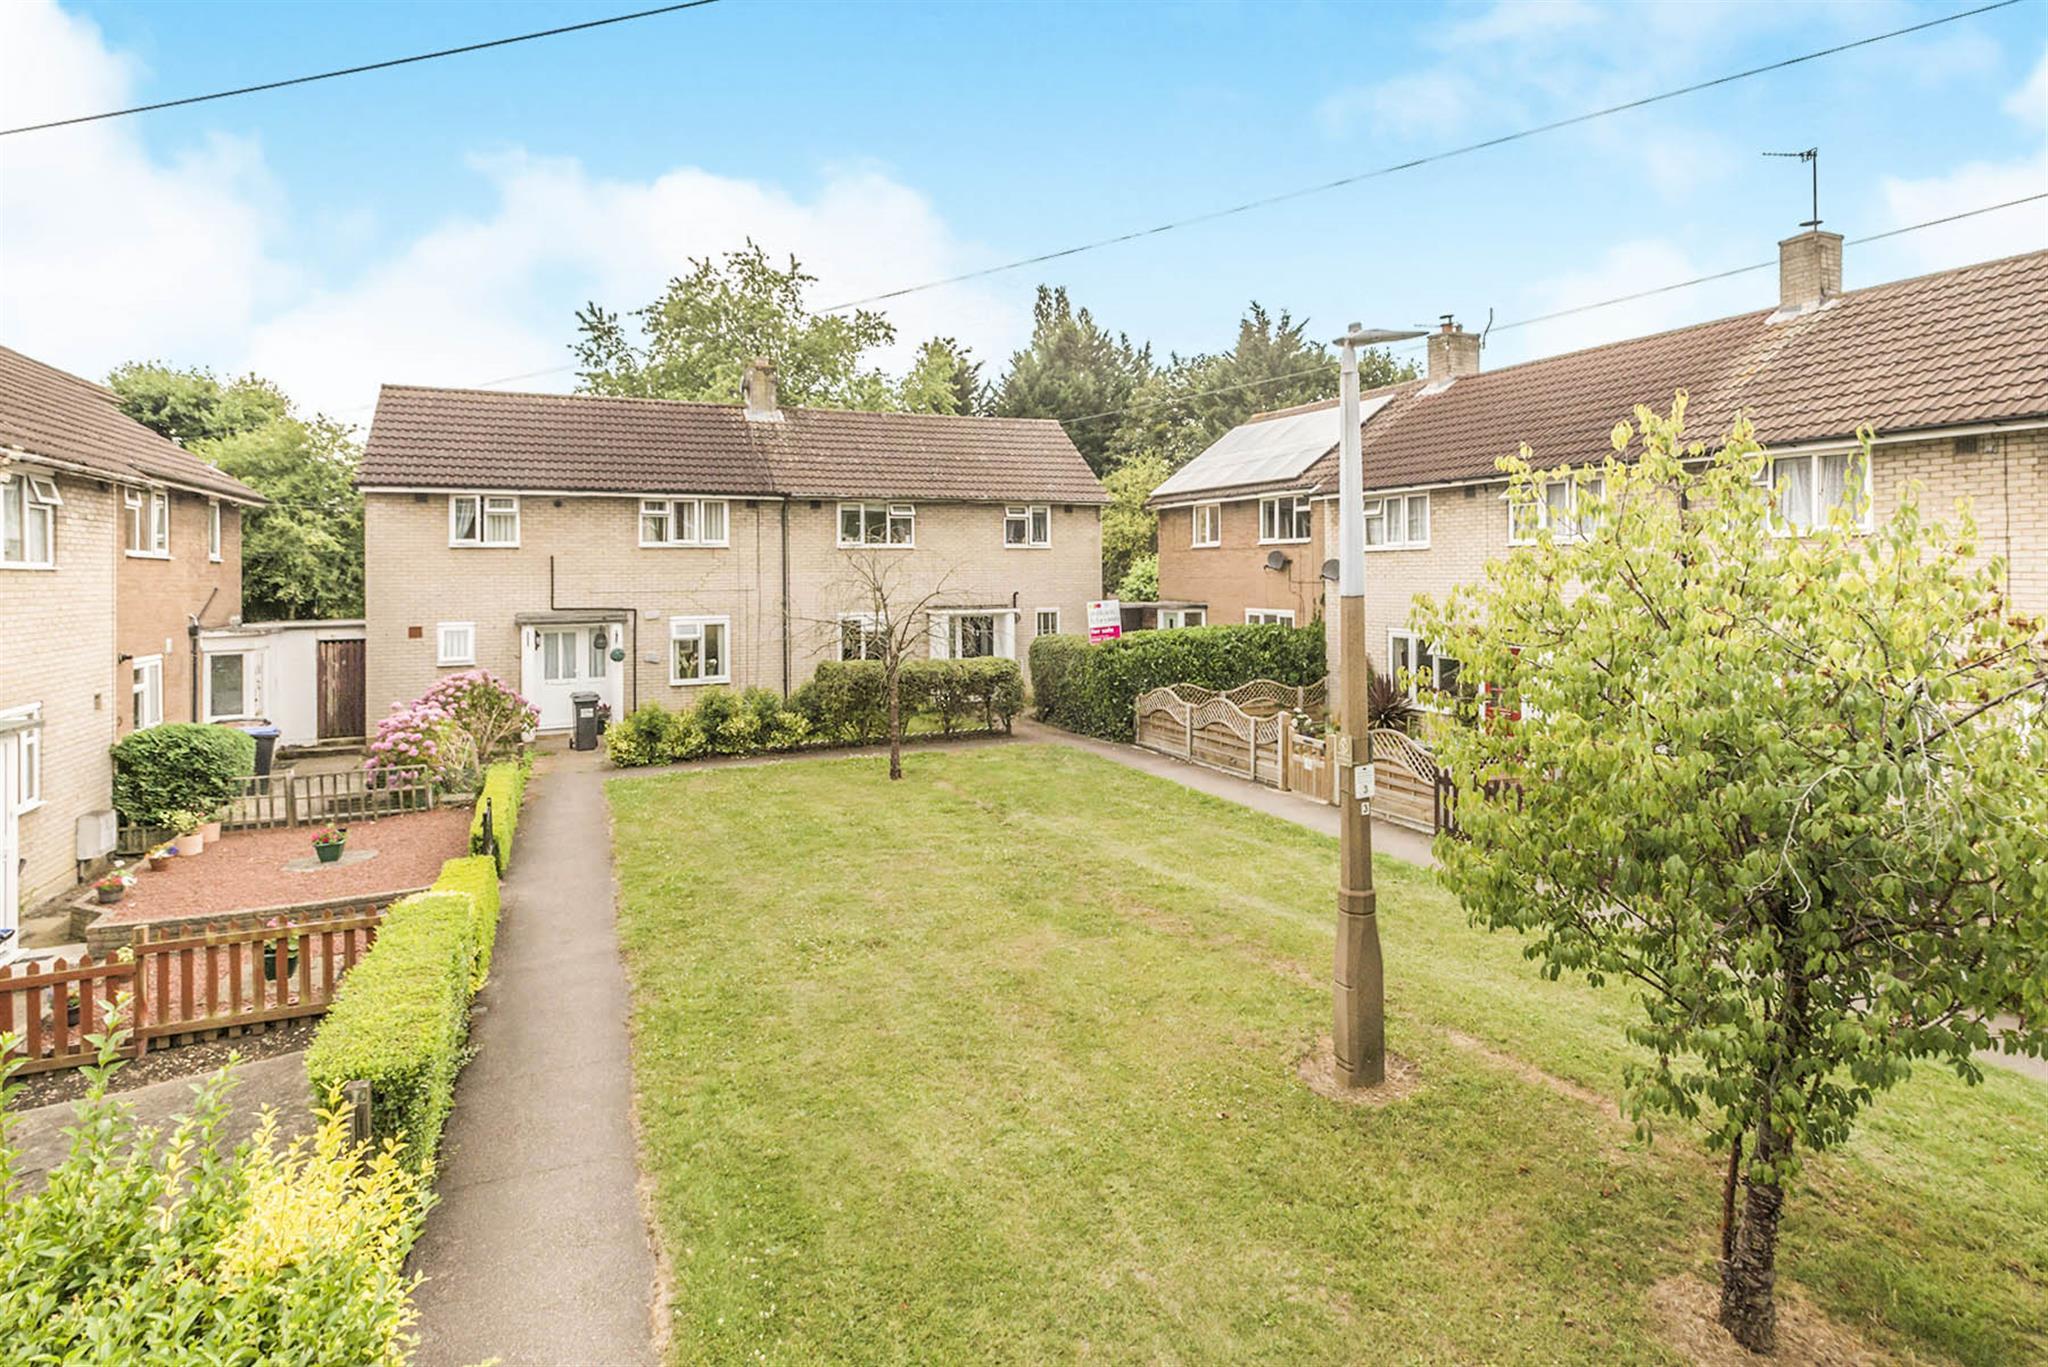 2 Bedroom Houses For Sale In Welwyn Garden City 28